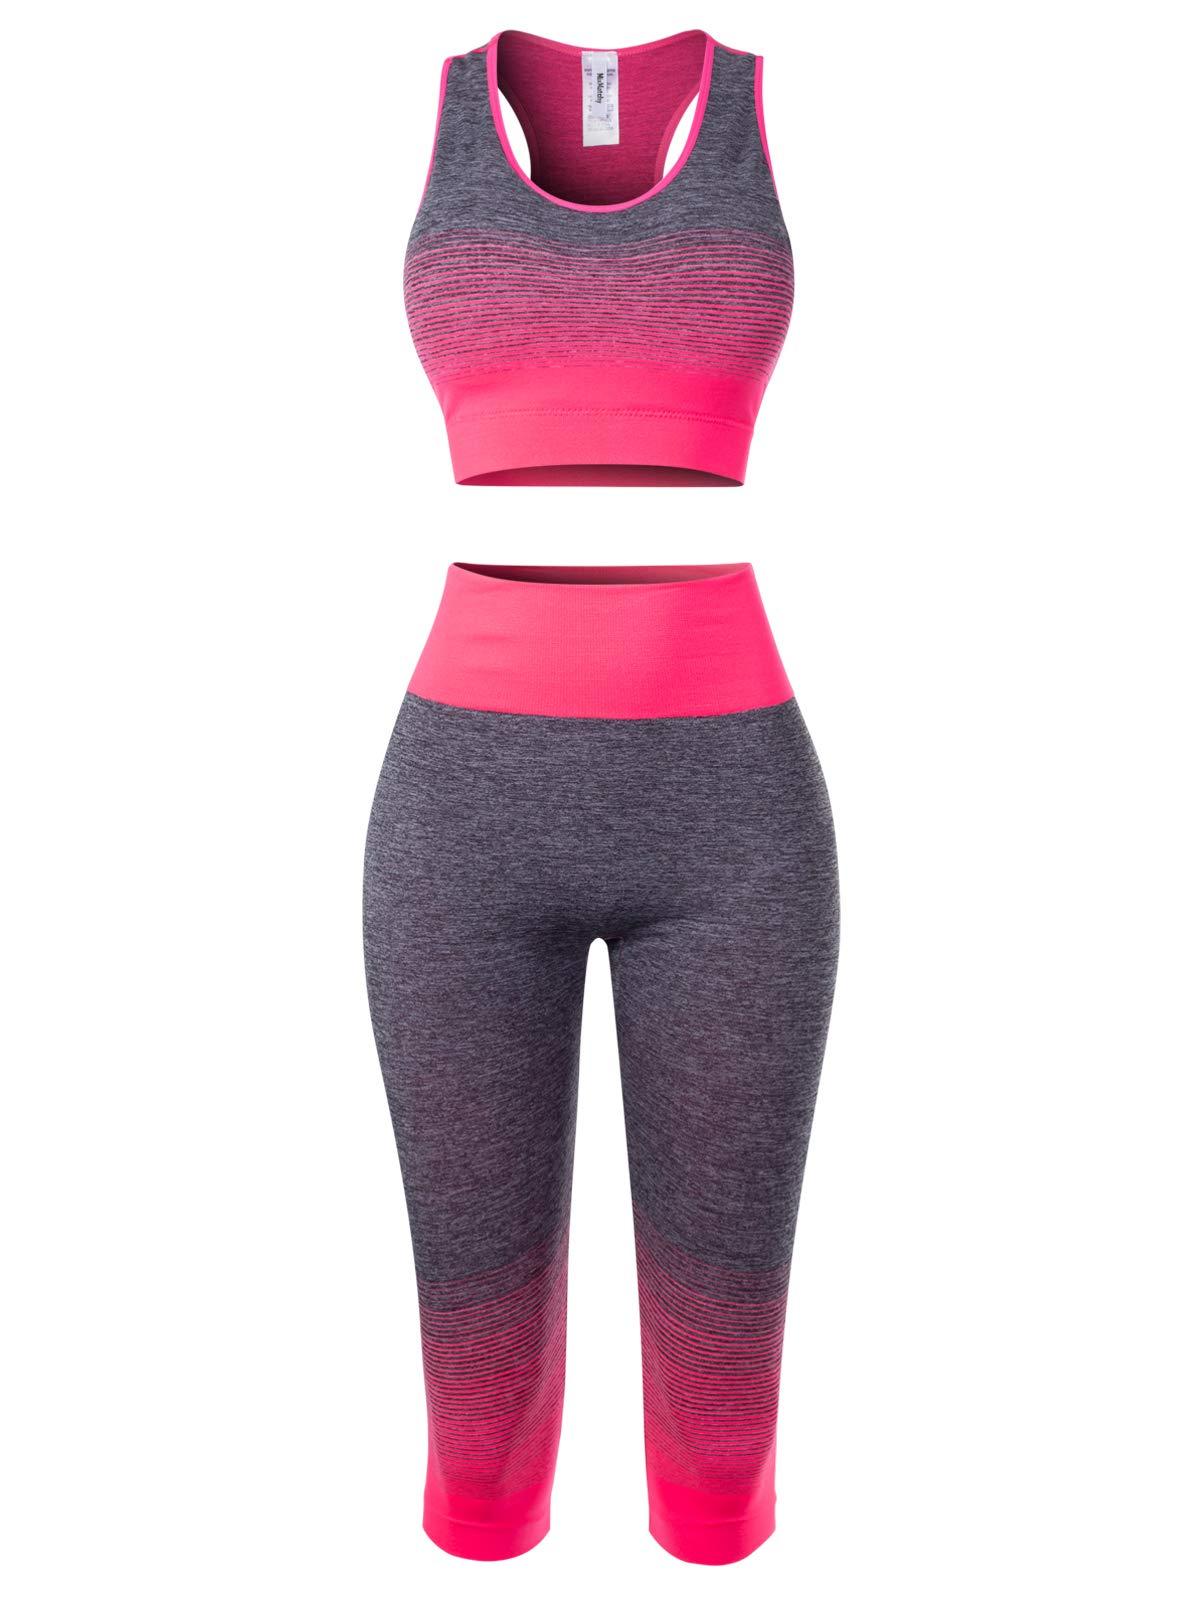 MixMatchy Women's Two-Piece Sports Bra + Capri Leggings Gym Yoga Wear Set Fuchsia ONE by MixMatchy